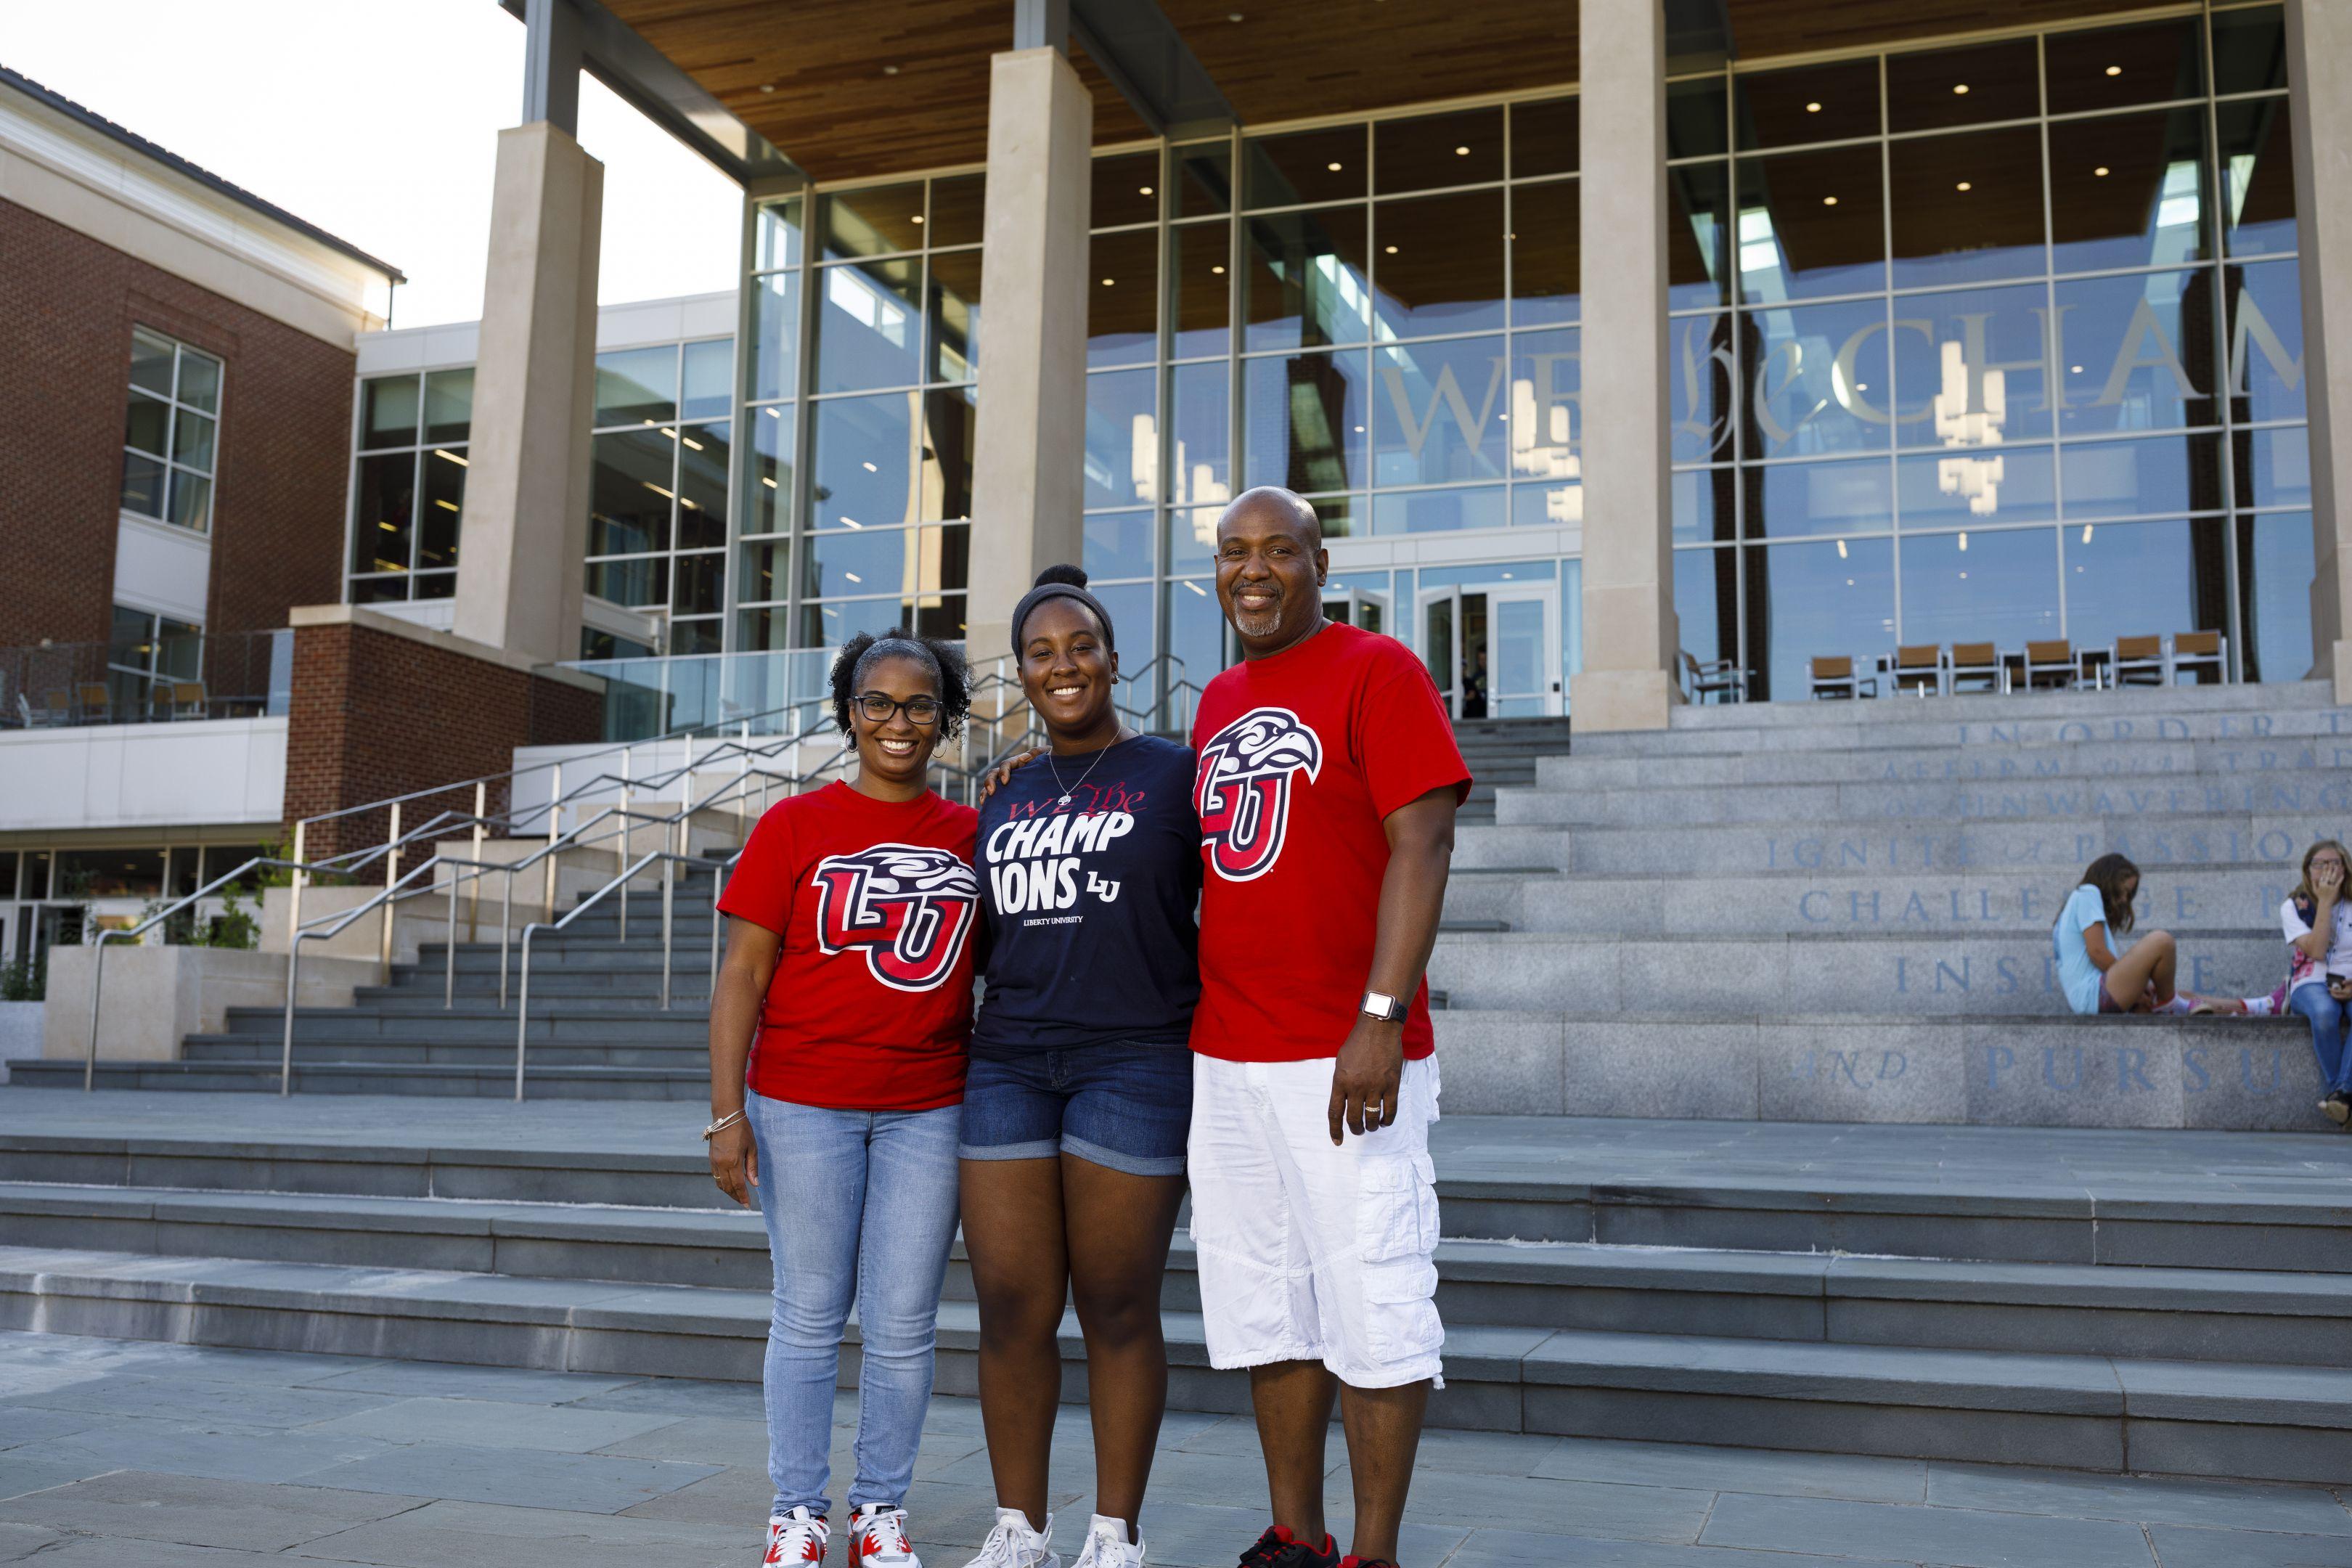 Parents VA State Resident Perks